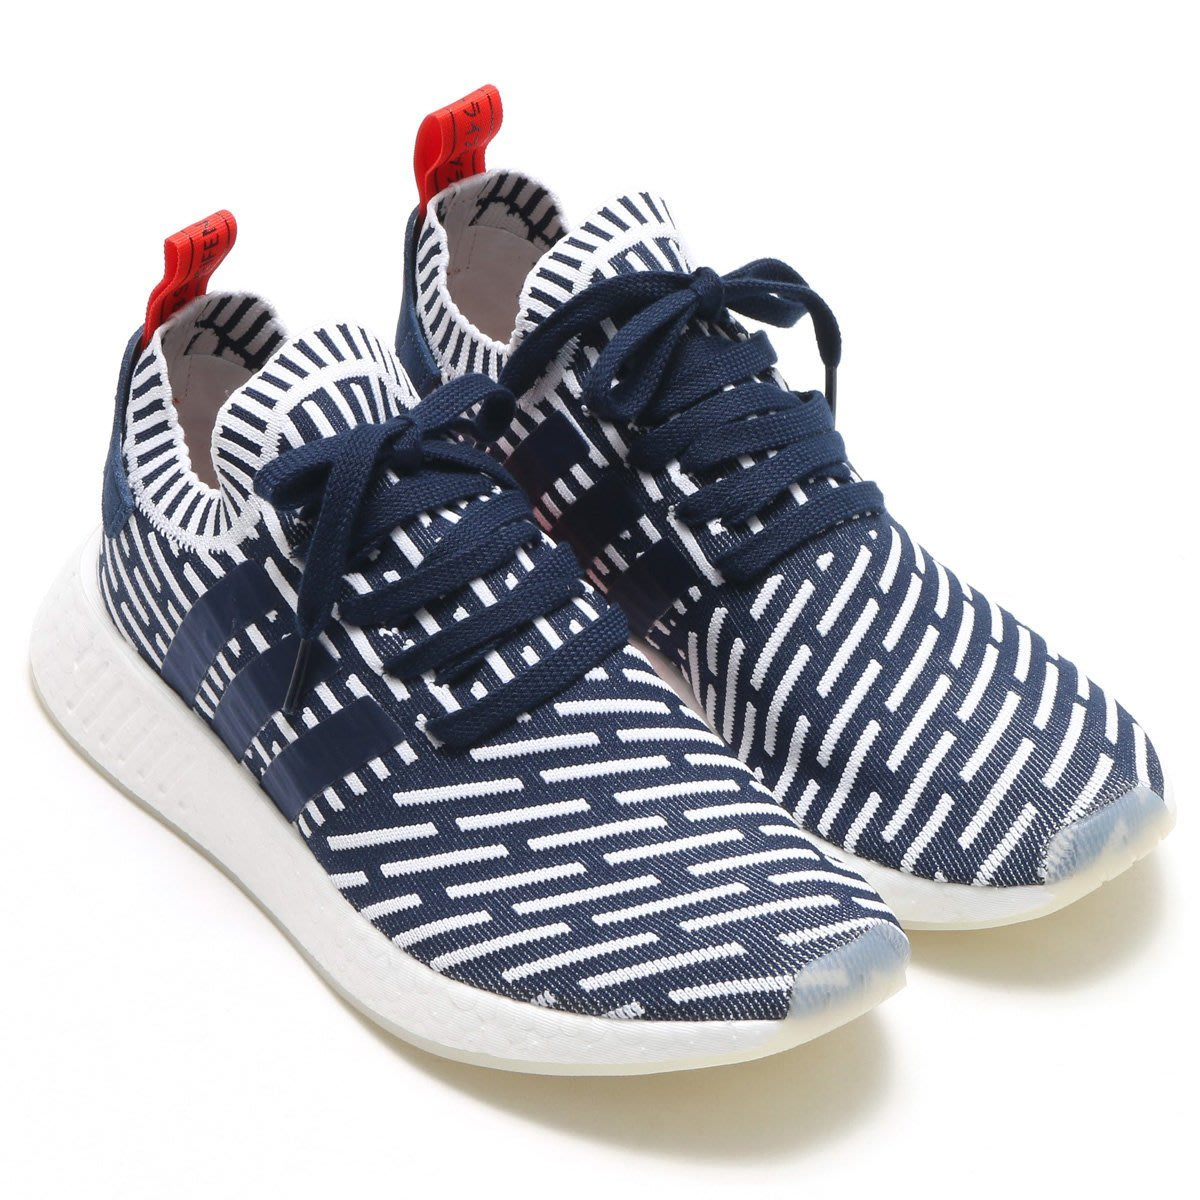 size 40 a70c2 9ad8b CodE= ADIDAS ORIGINALS NMD R2 PK 編織慢跑鞋(藍白紅)BB2909 ...